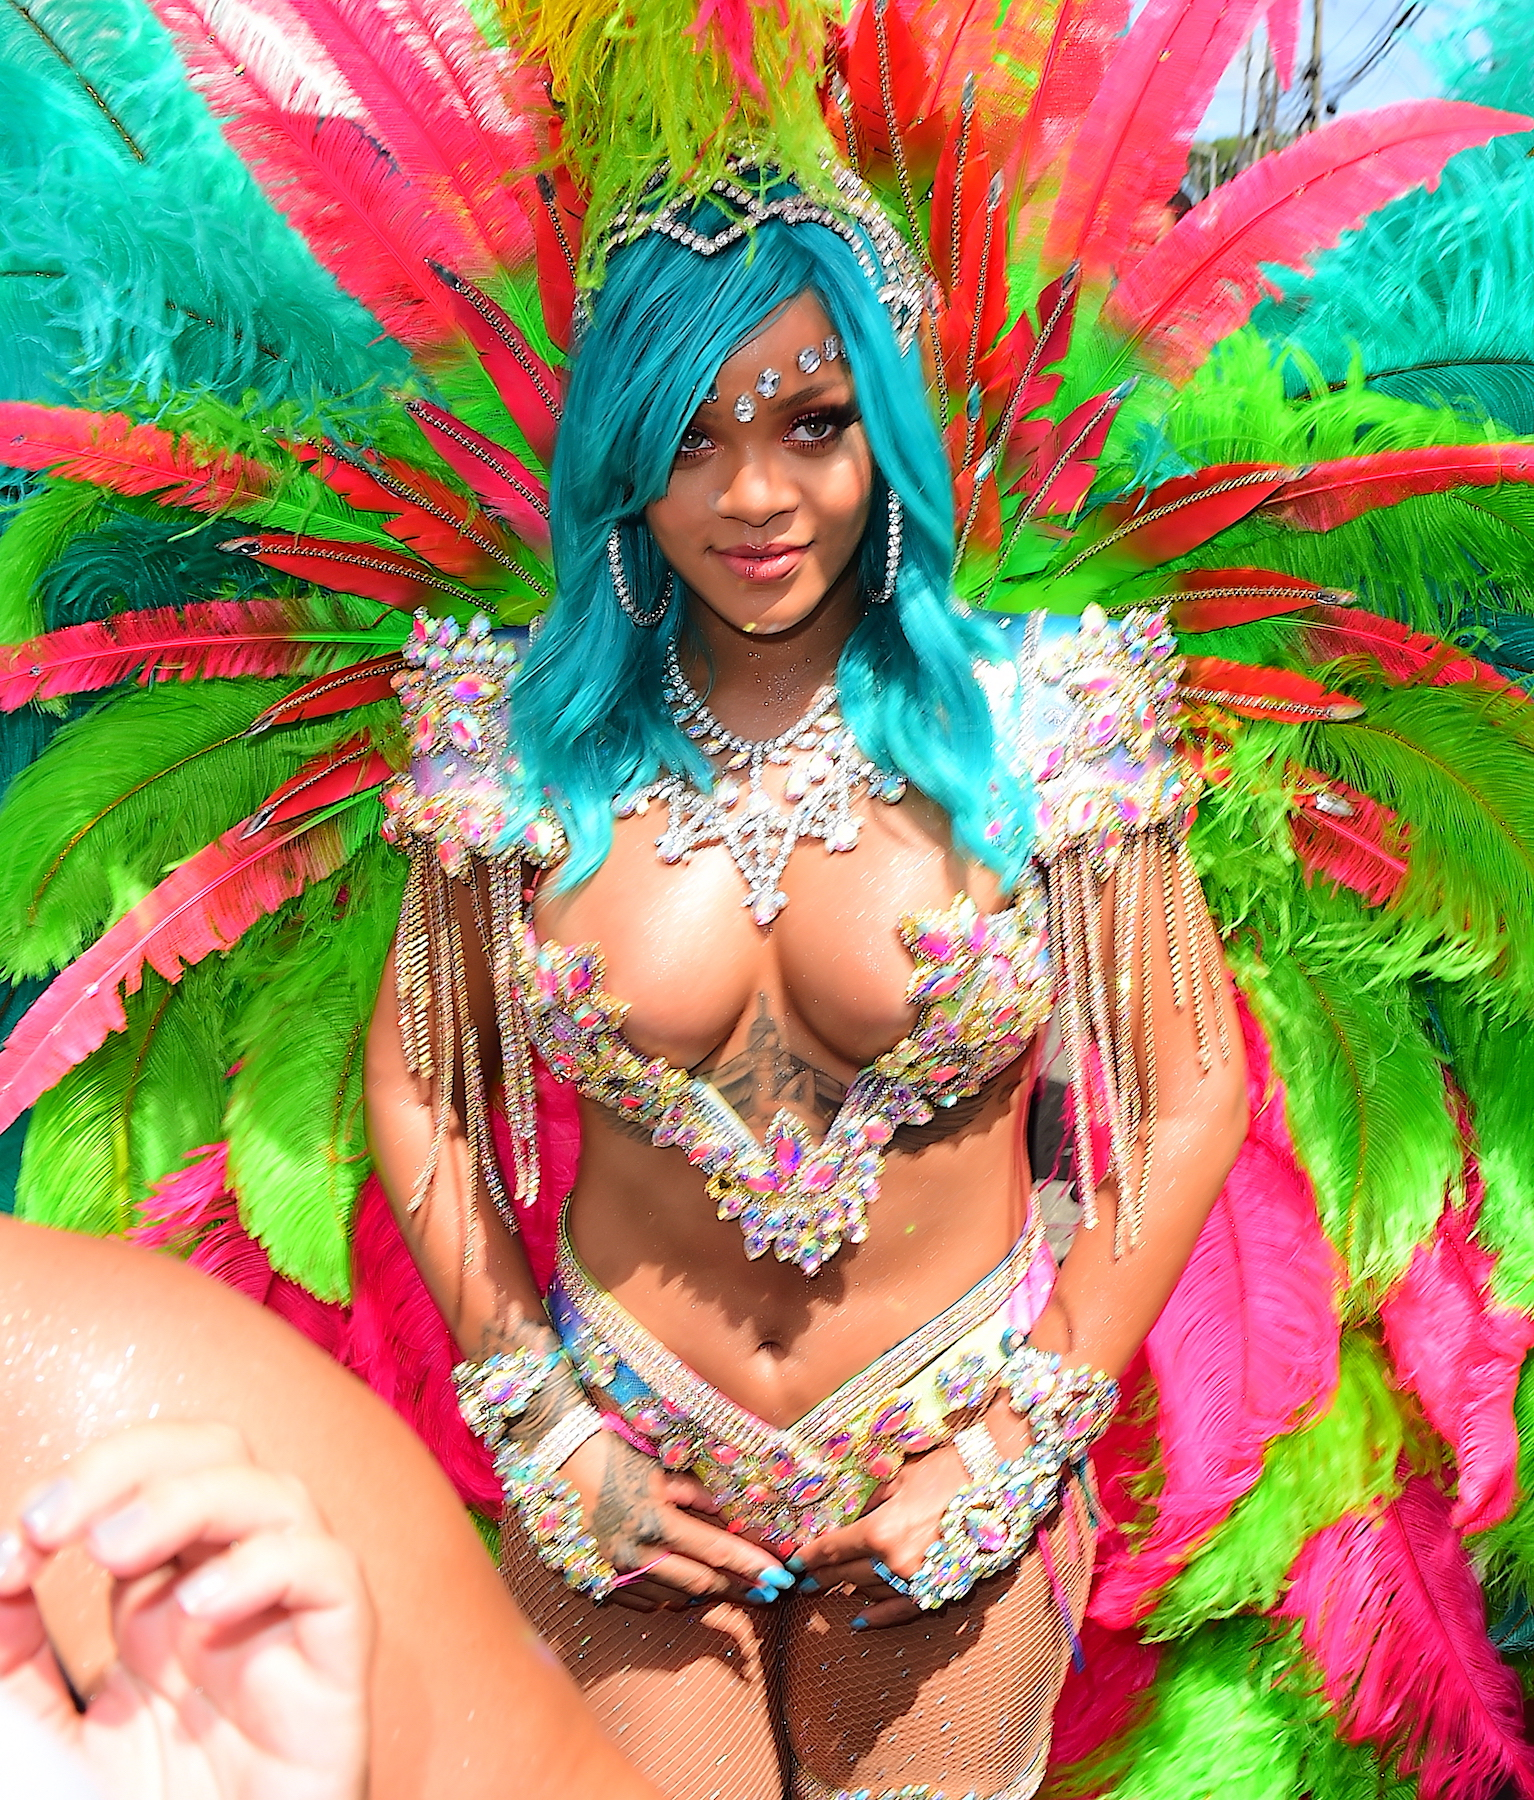 Rihanna Crop over festival